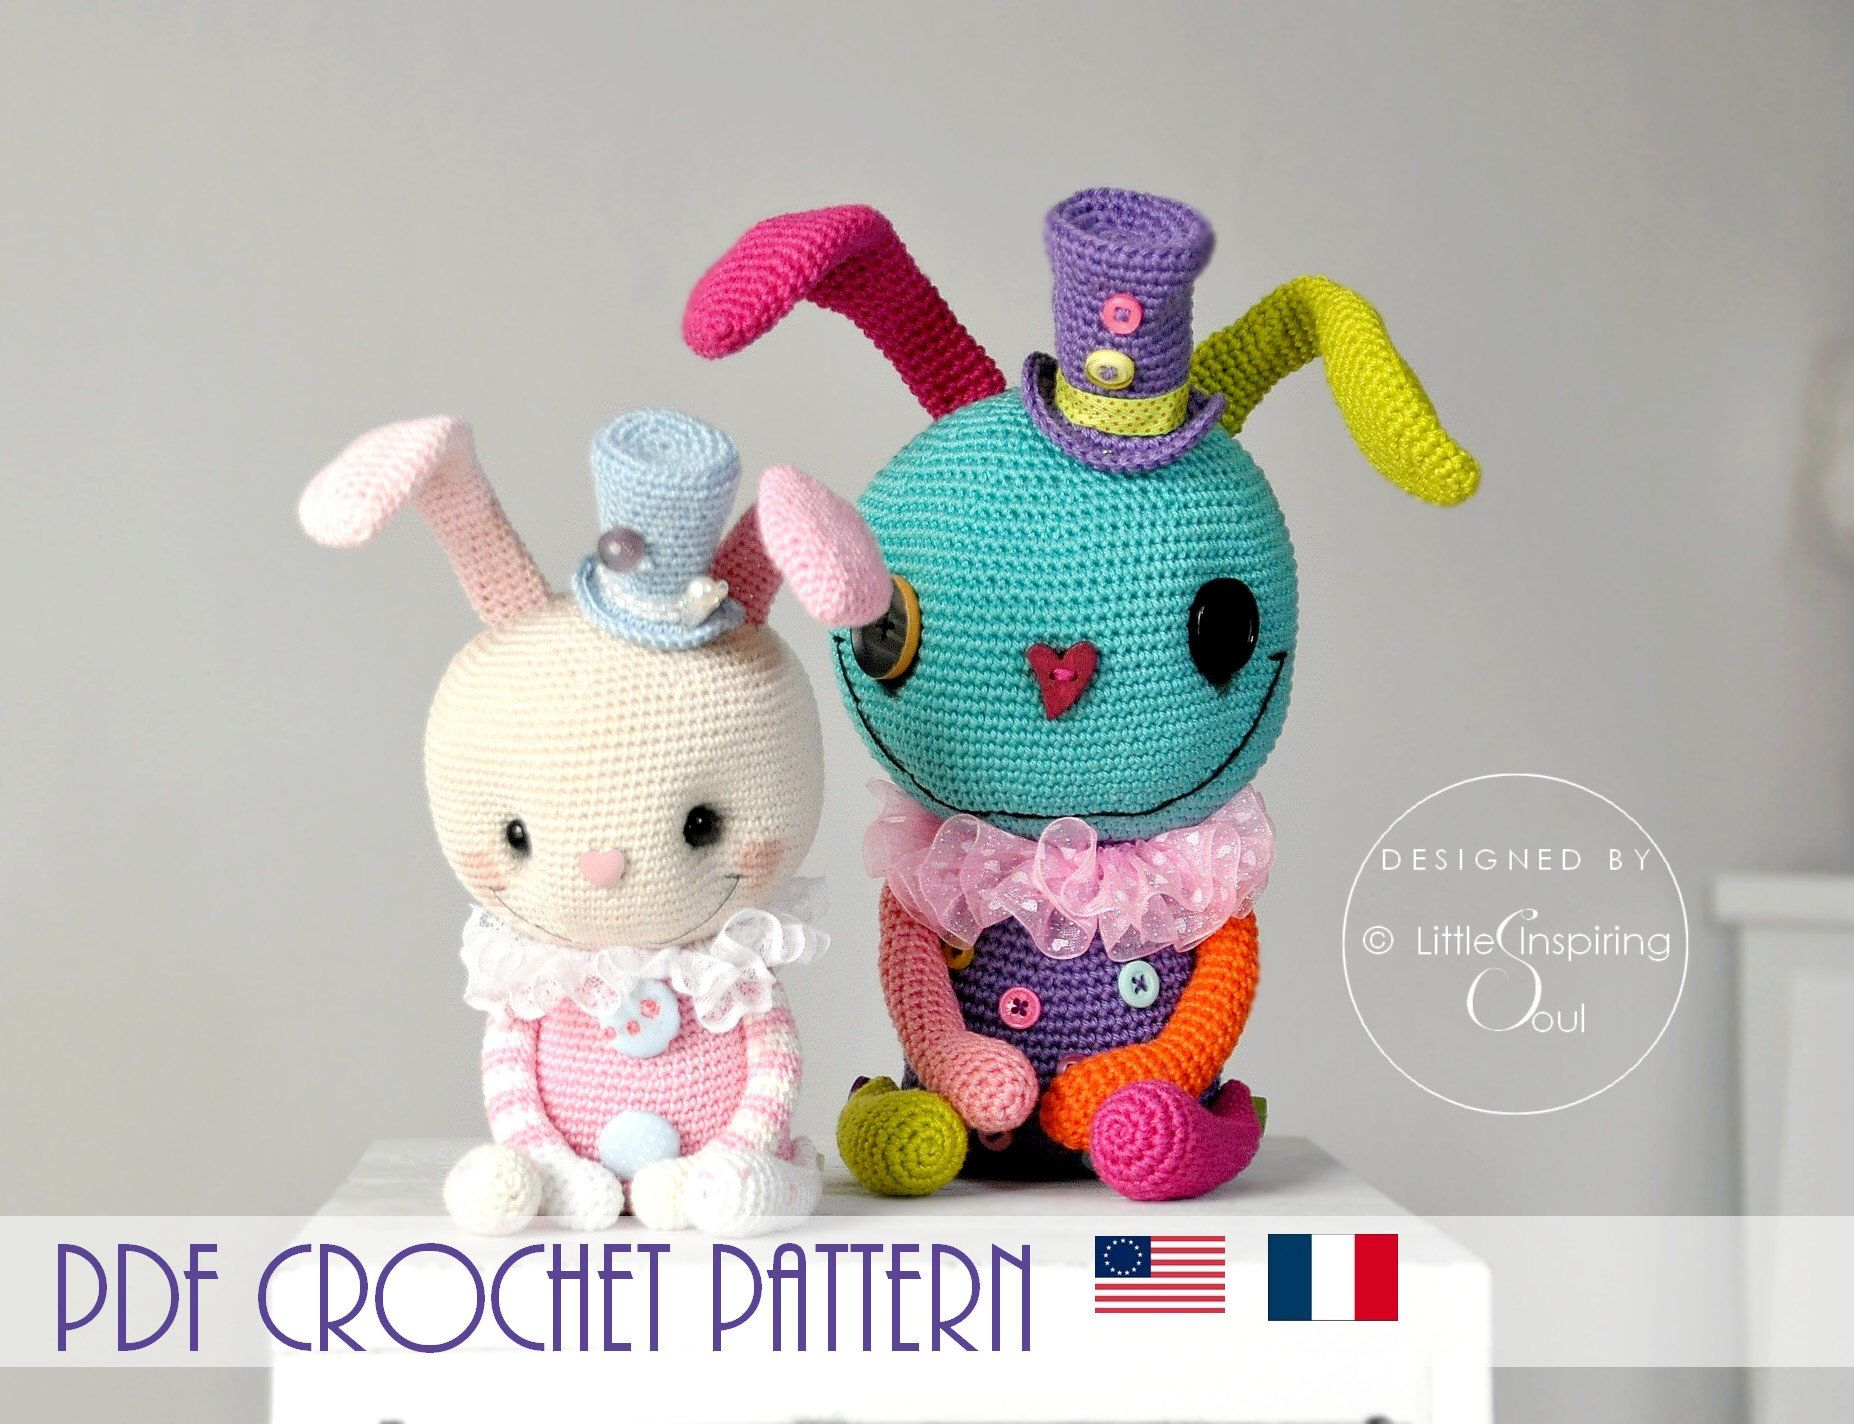 Crochet Motif Lapin - Crochet bébé | Crochet bunny pattern ... | 1424x1854